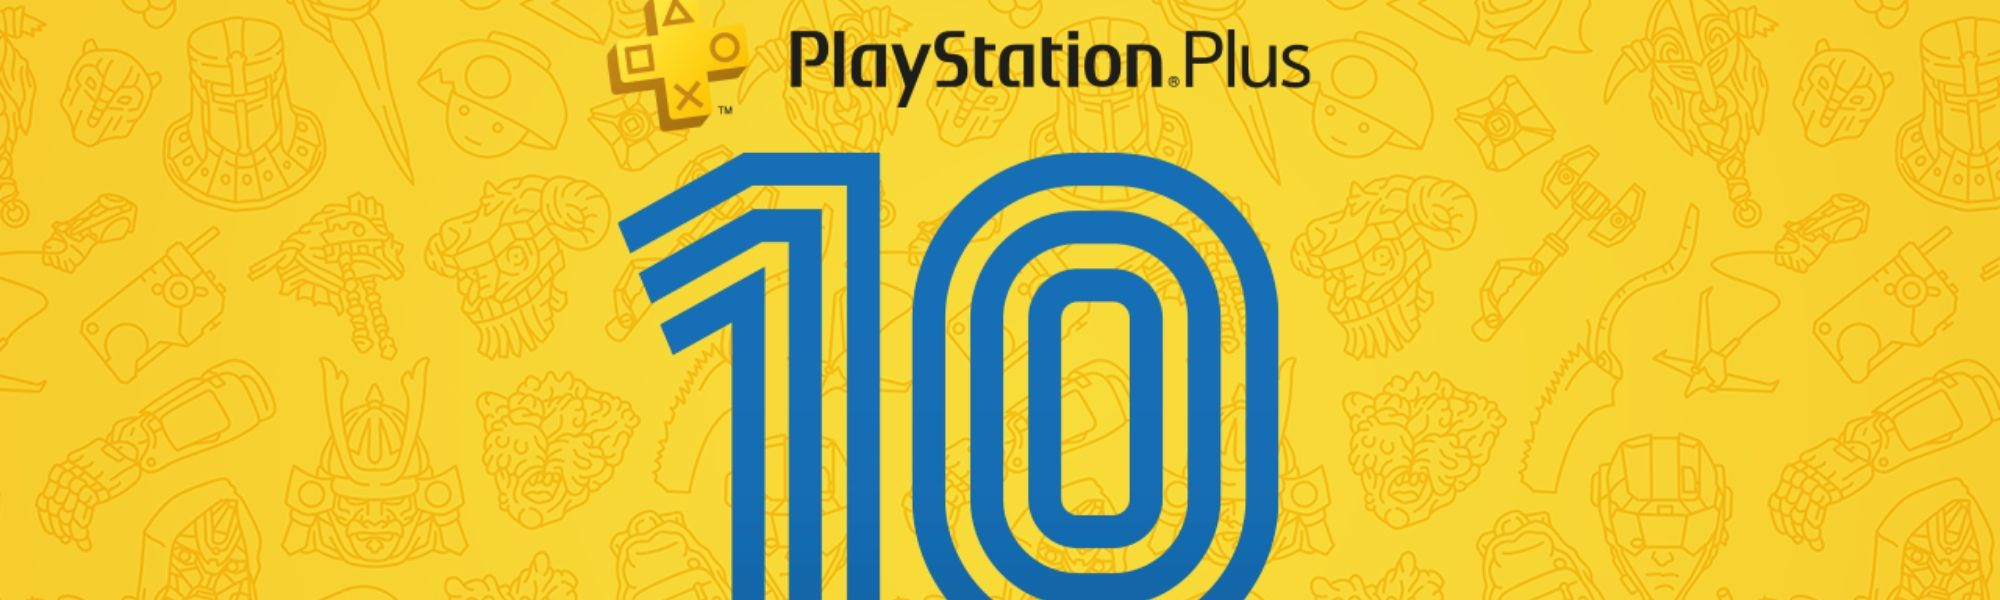 Oferta PlayStation Plus na 10-lecie usługi. Jest Rise of the Tomb Raider!